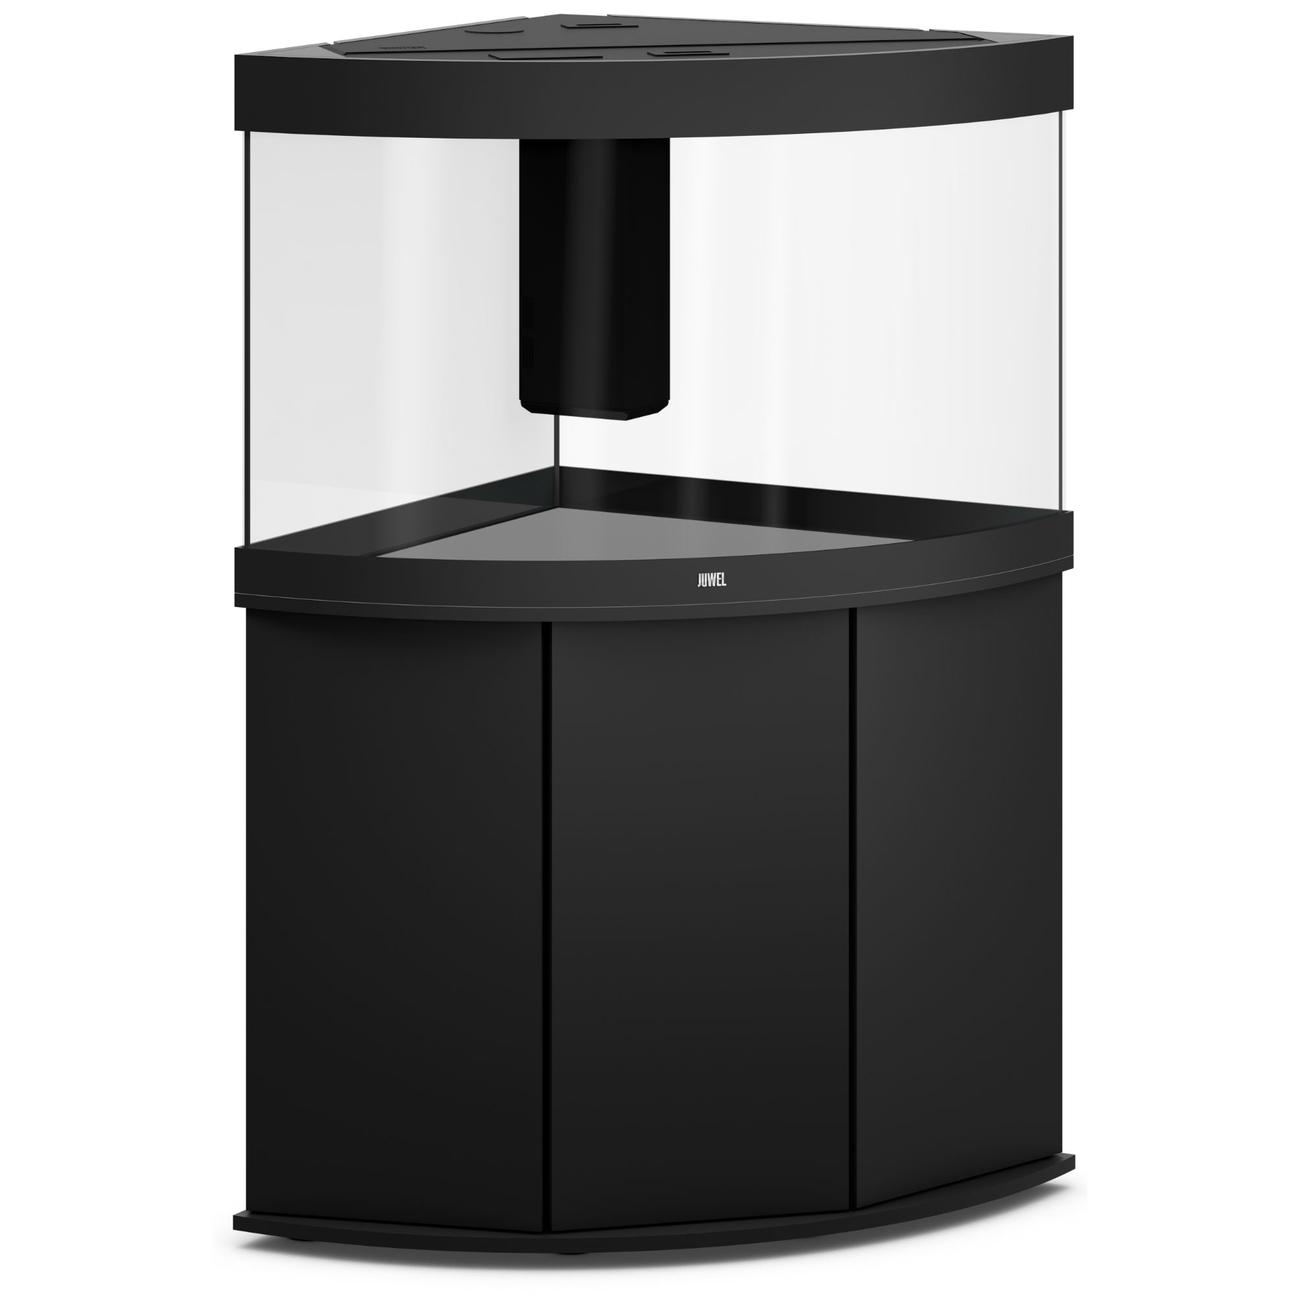 Juwel Trigon 190 LED Eck-Aquarium mit Unterschrank Bild 3